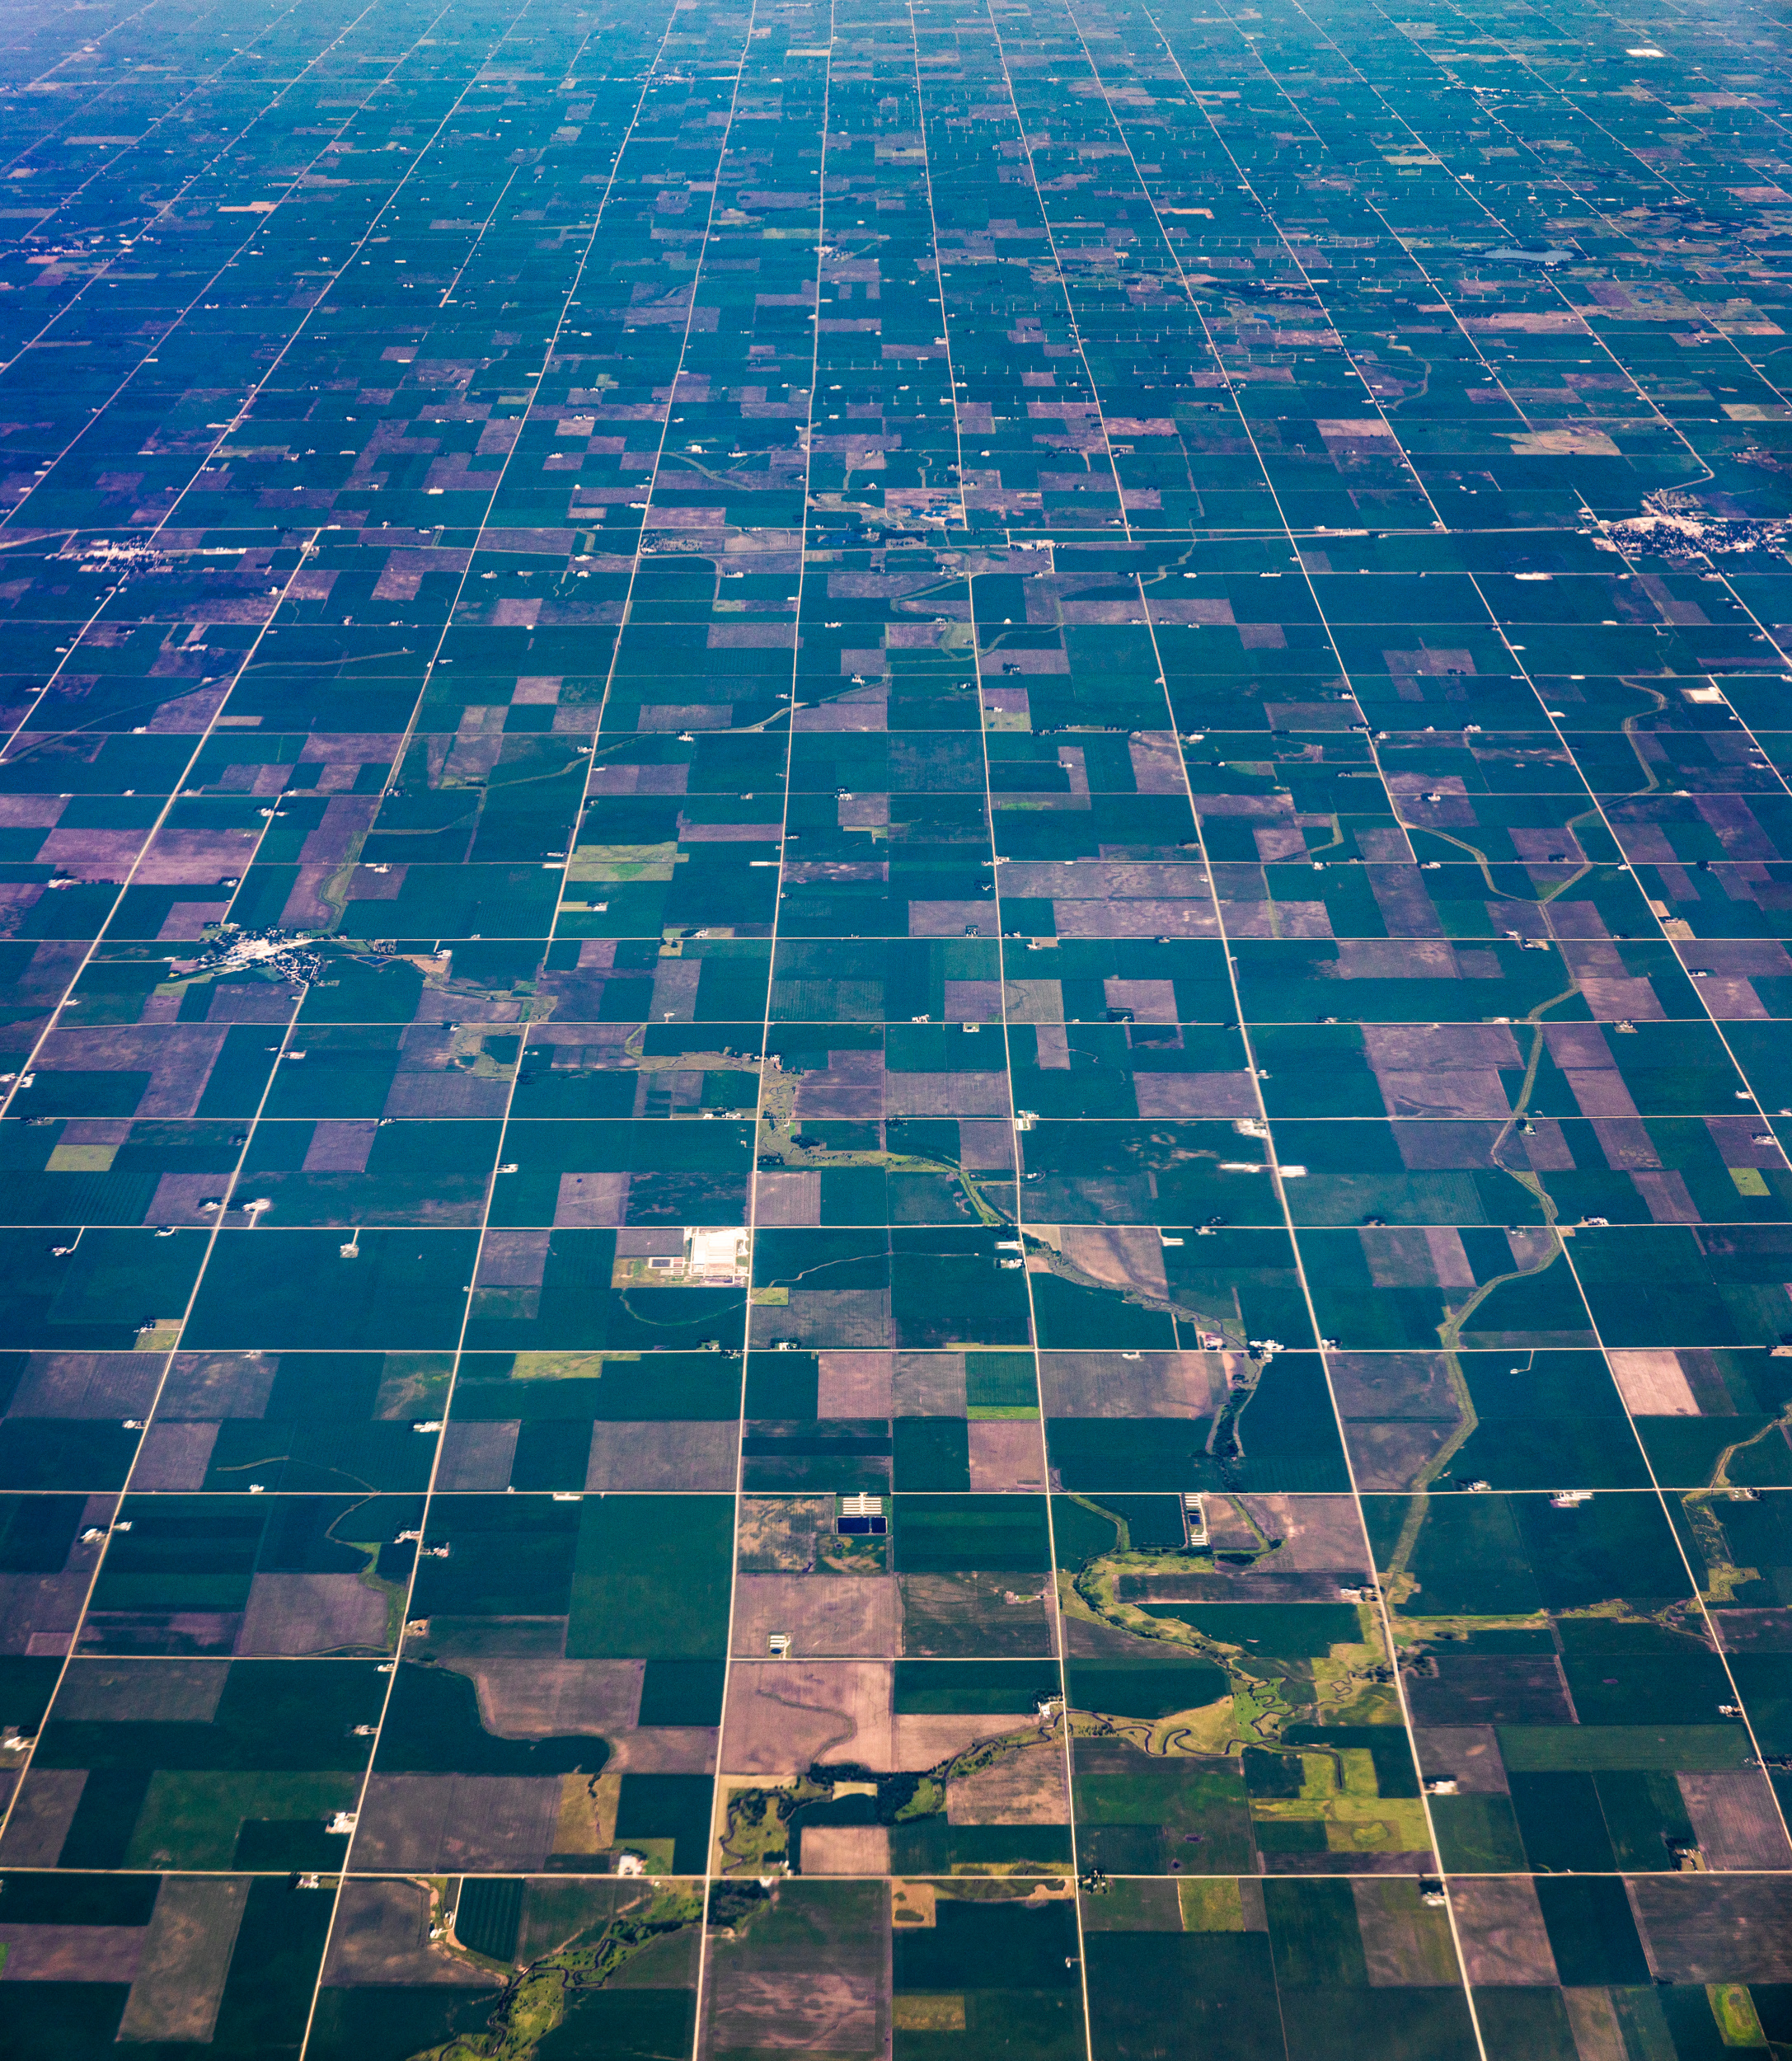 Aerials for Bannon 2019 (2.5k)-15.jpg